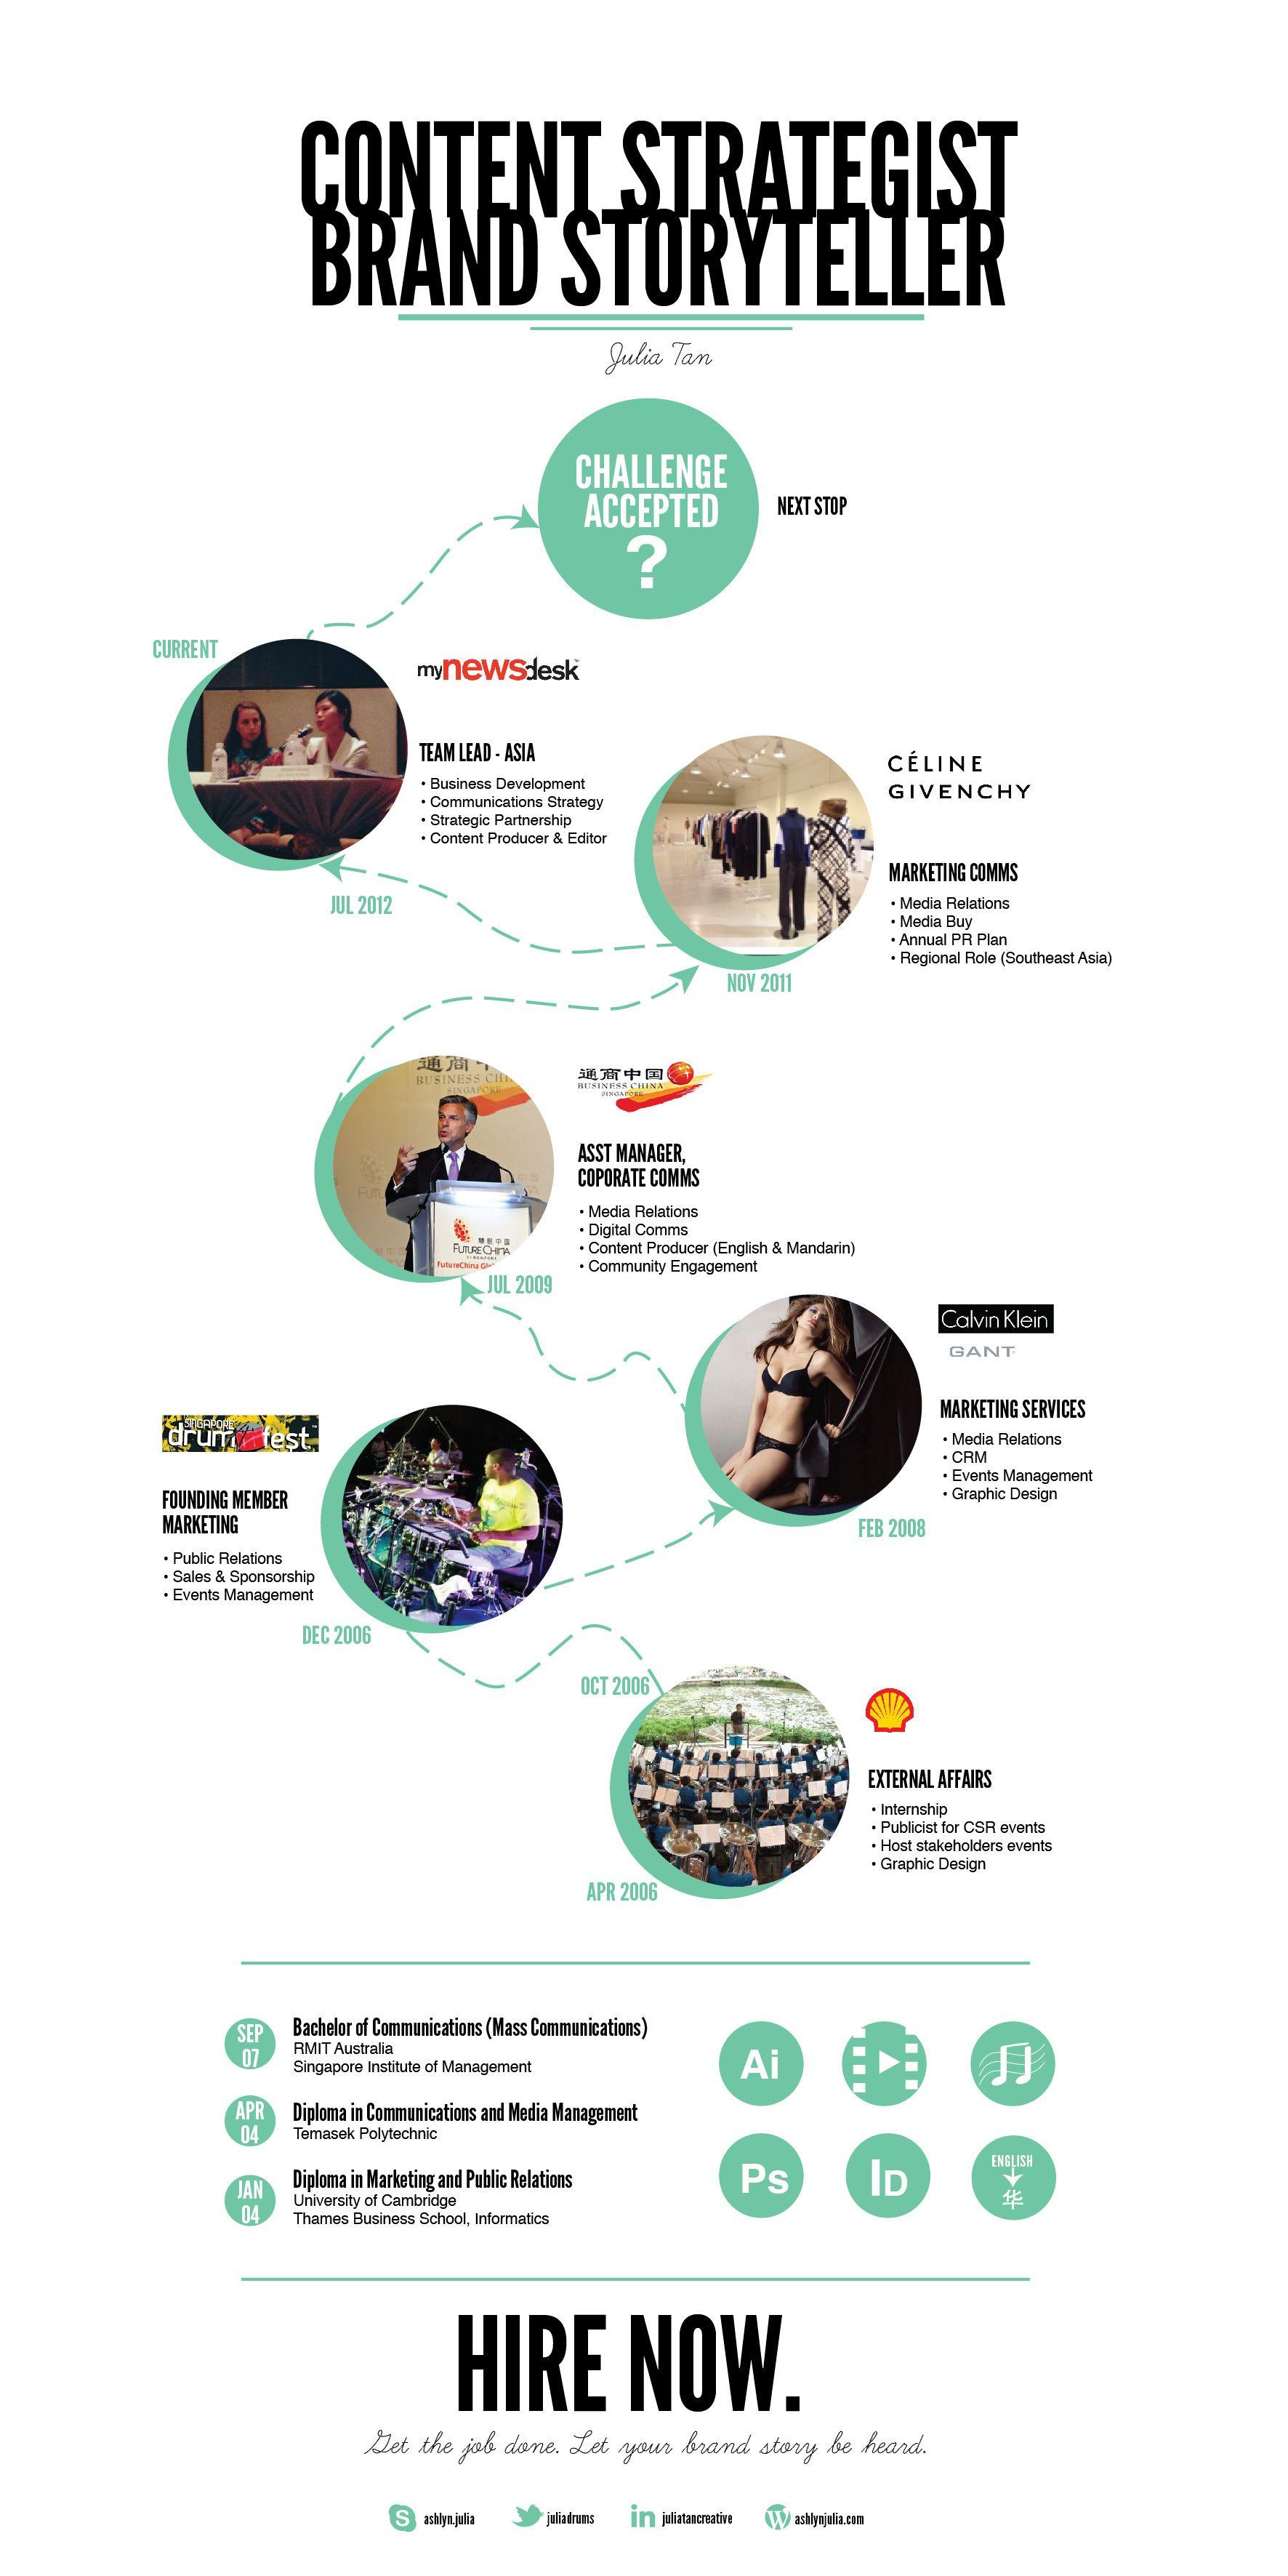 BrandStorytellerContentStrategy  I  Branding